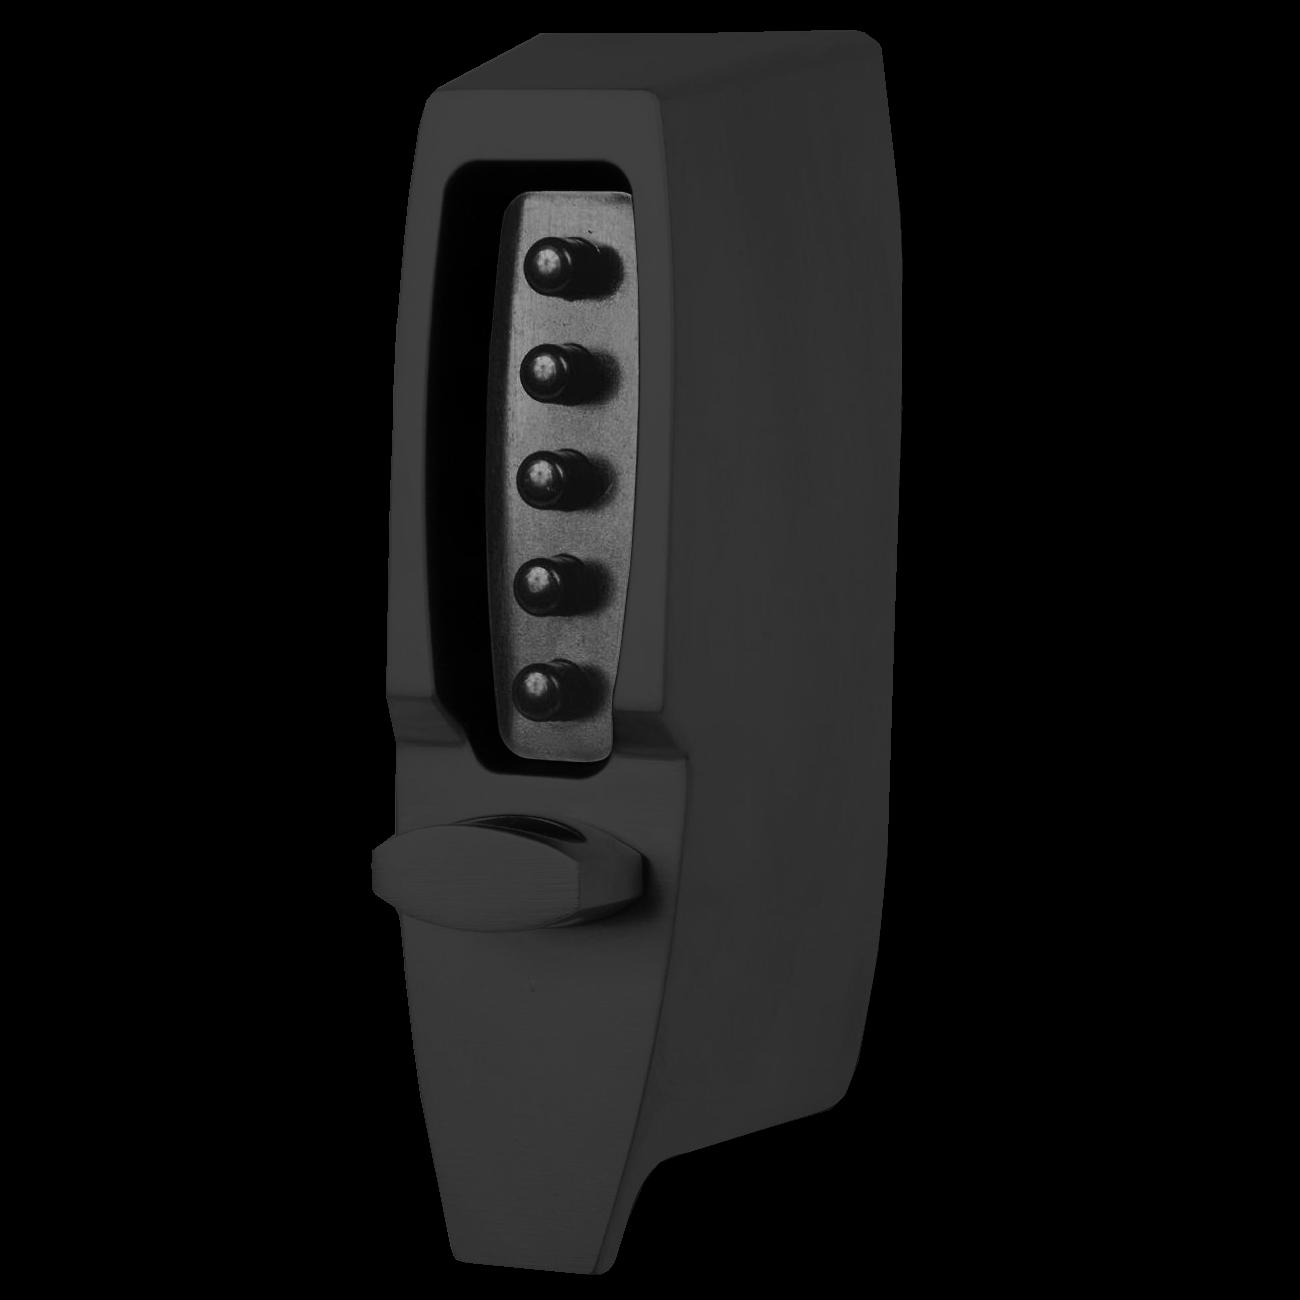 DORMAKABA 7100 Series 7106 Digital Lock Rim Deadlatch